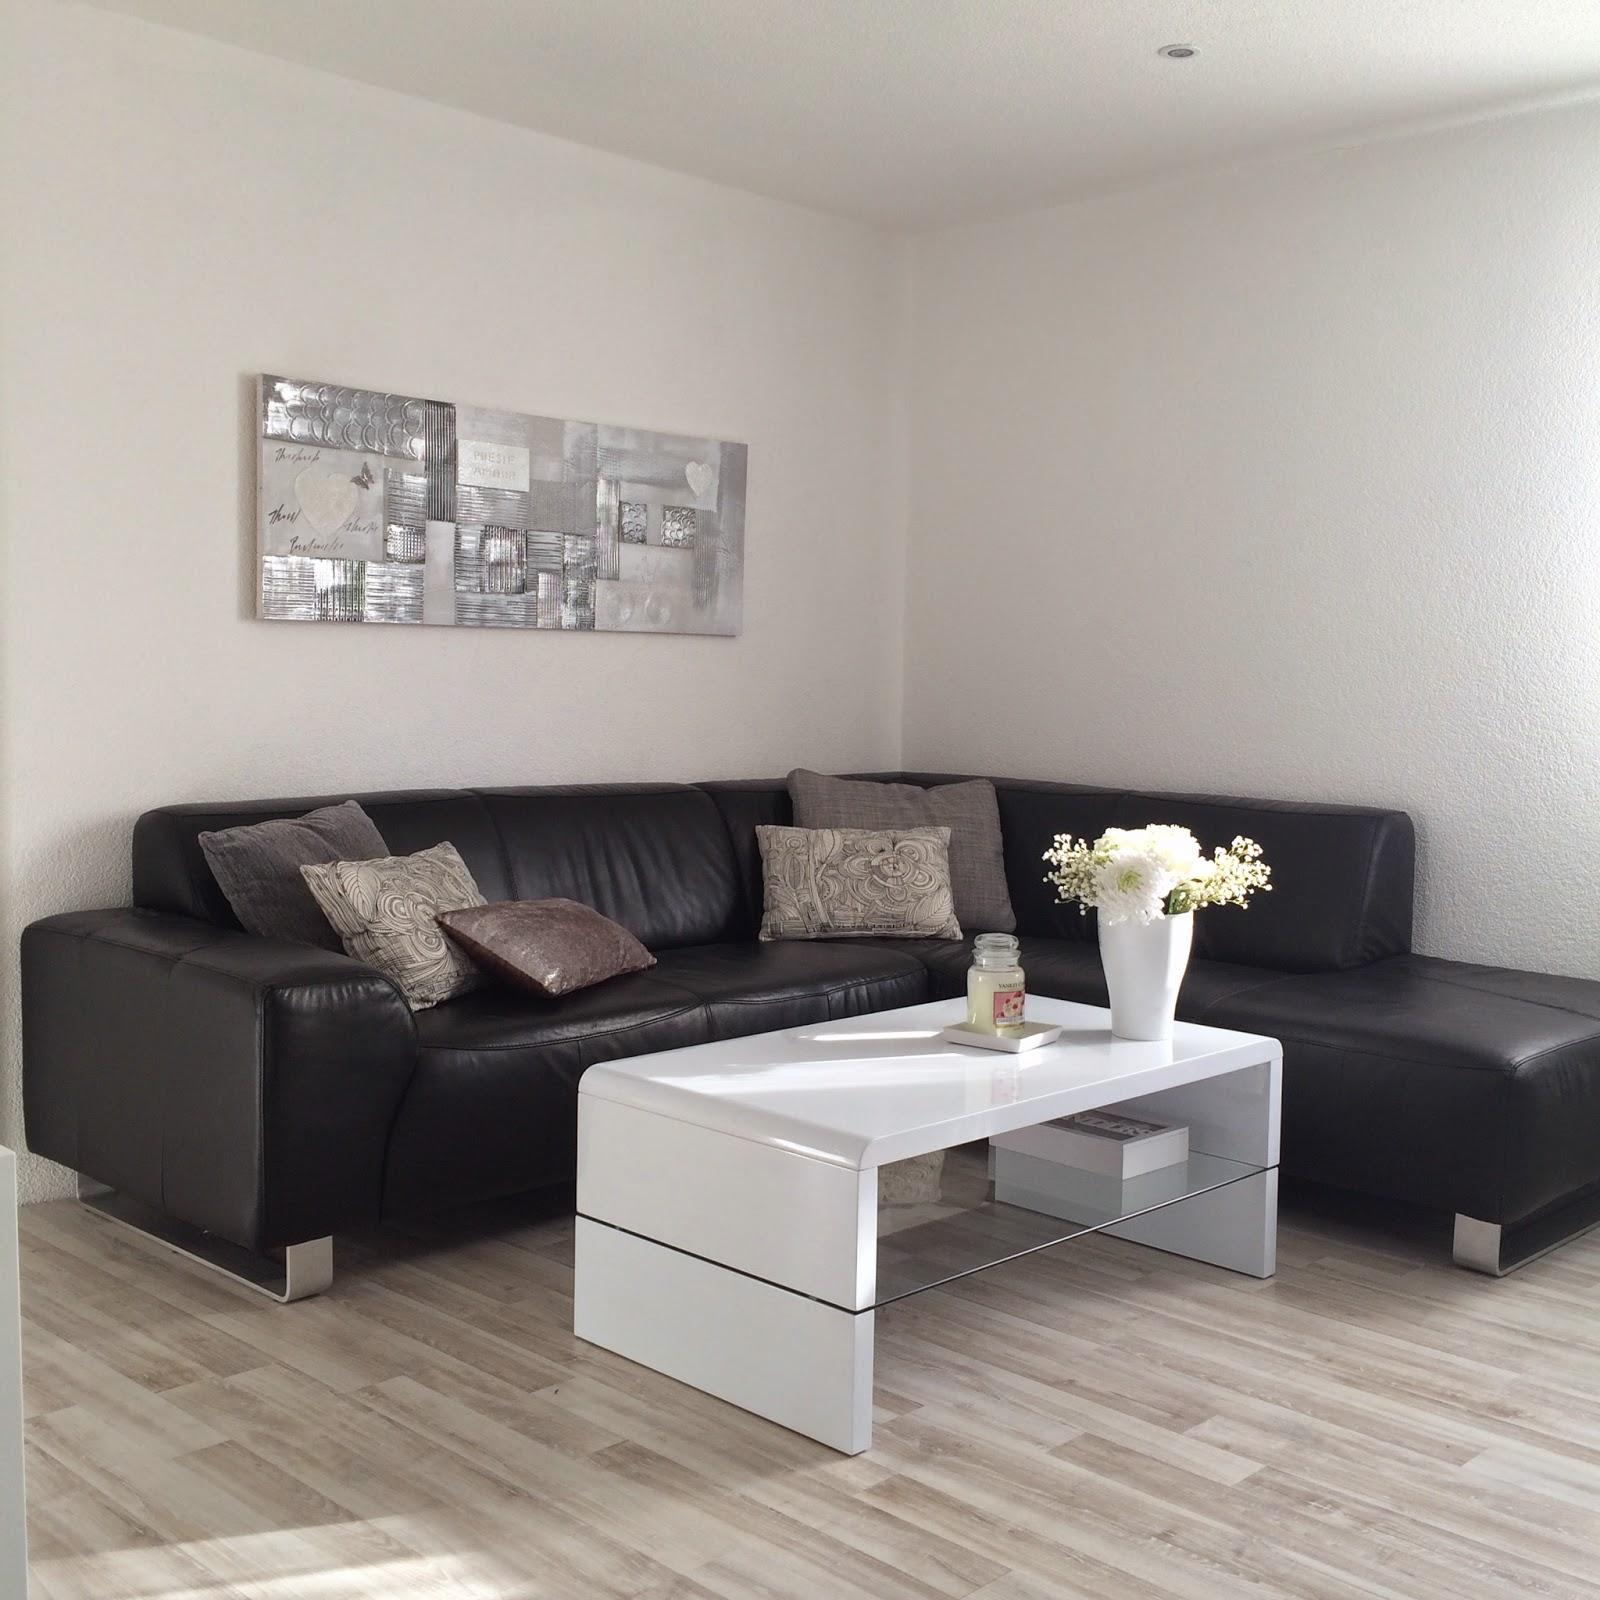 table basse de salon contemporaine. Black Bedroom Furniture Sets. Home Design Ideas